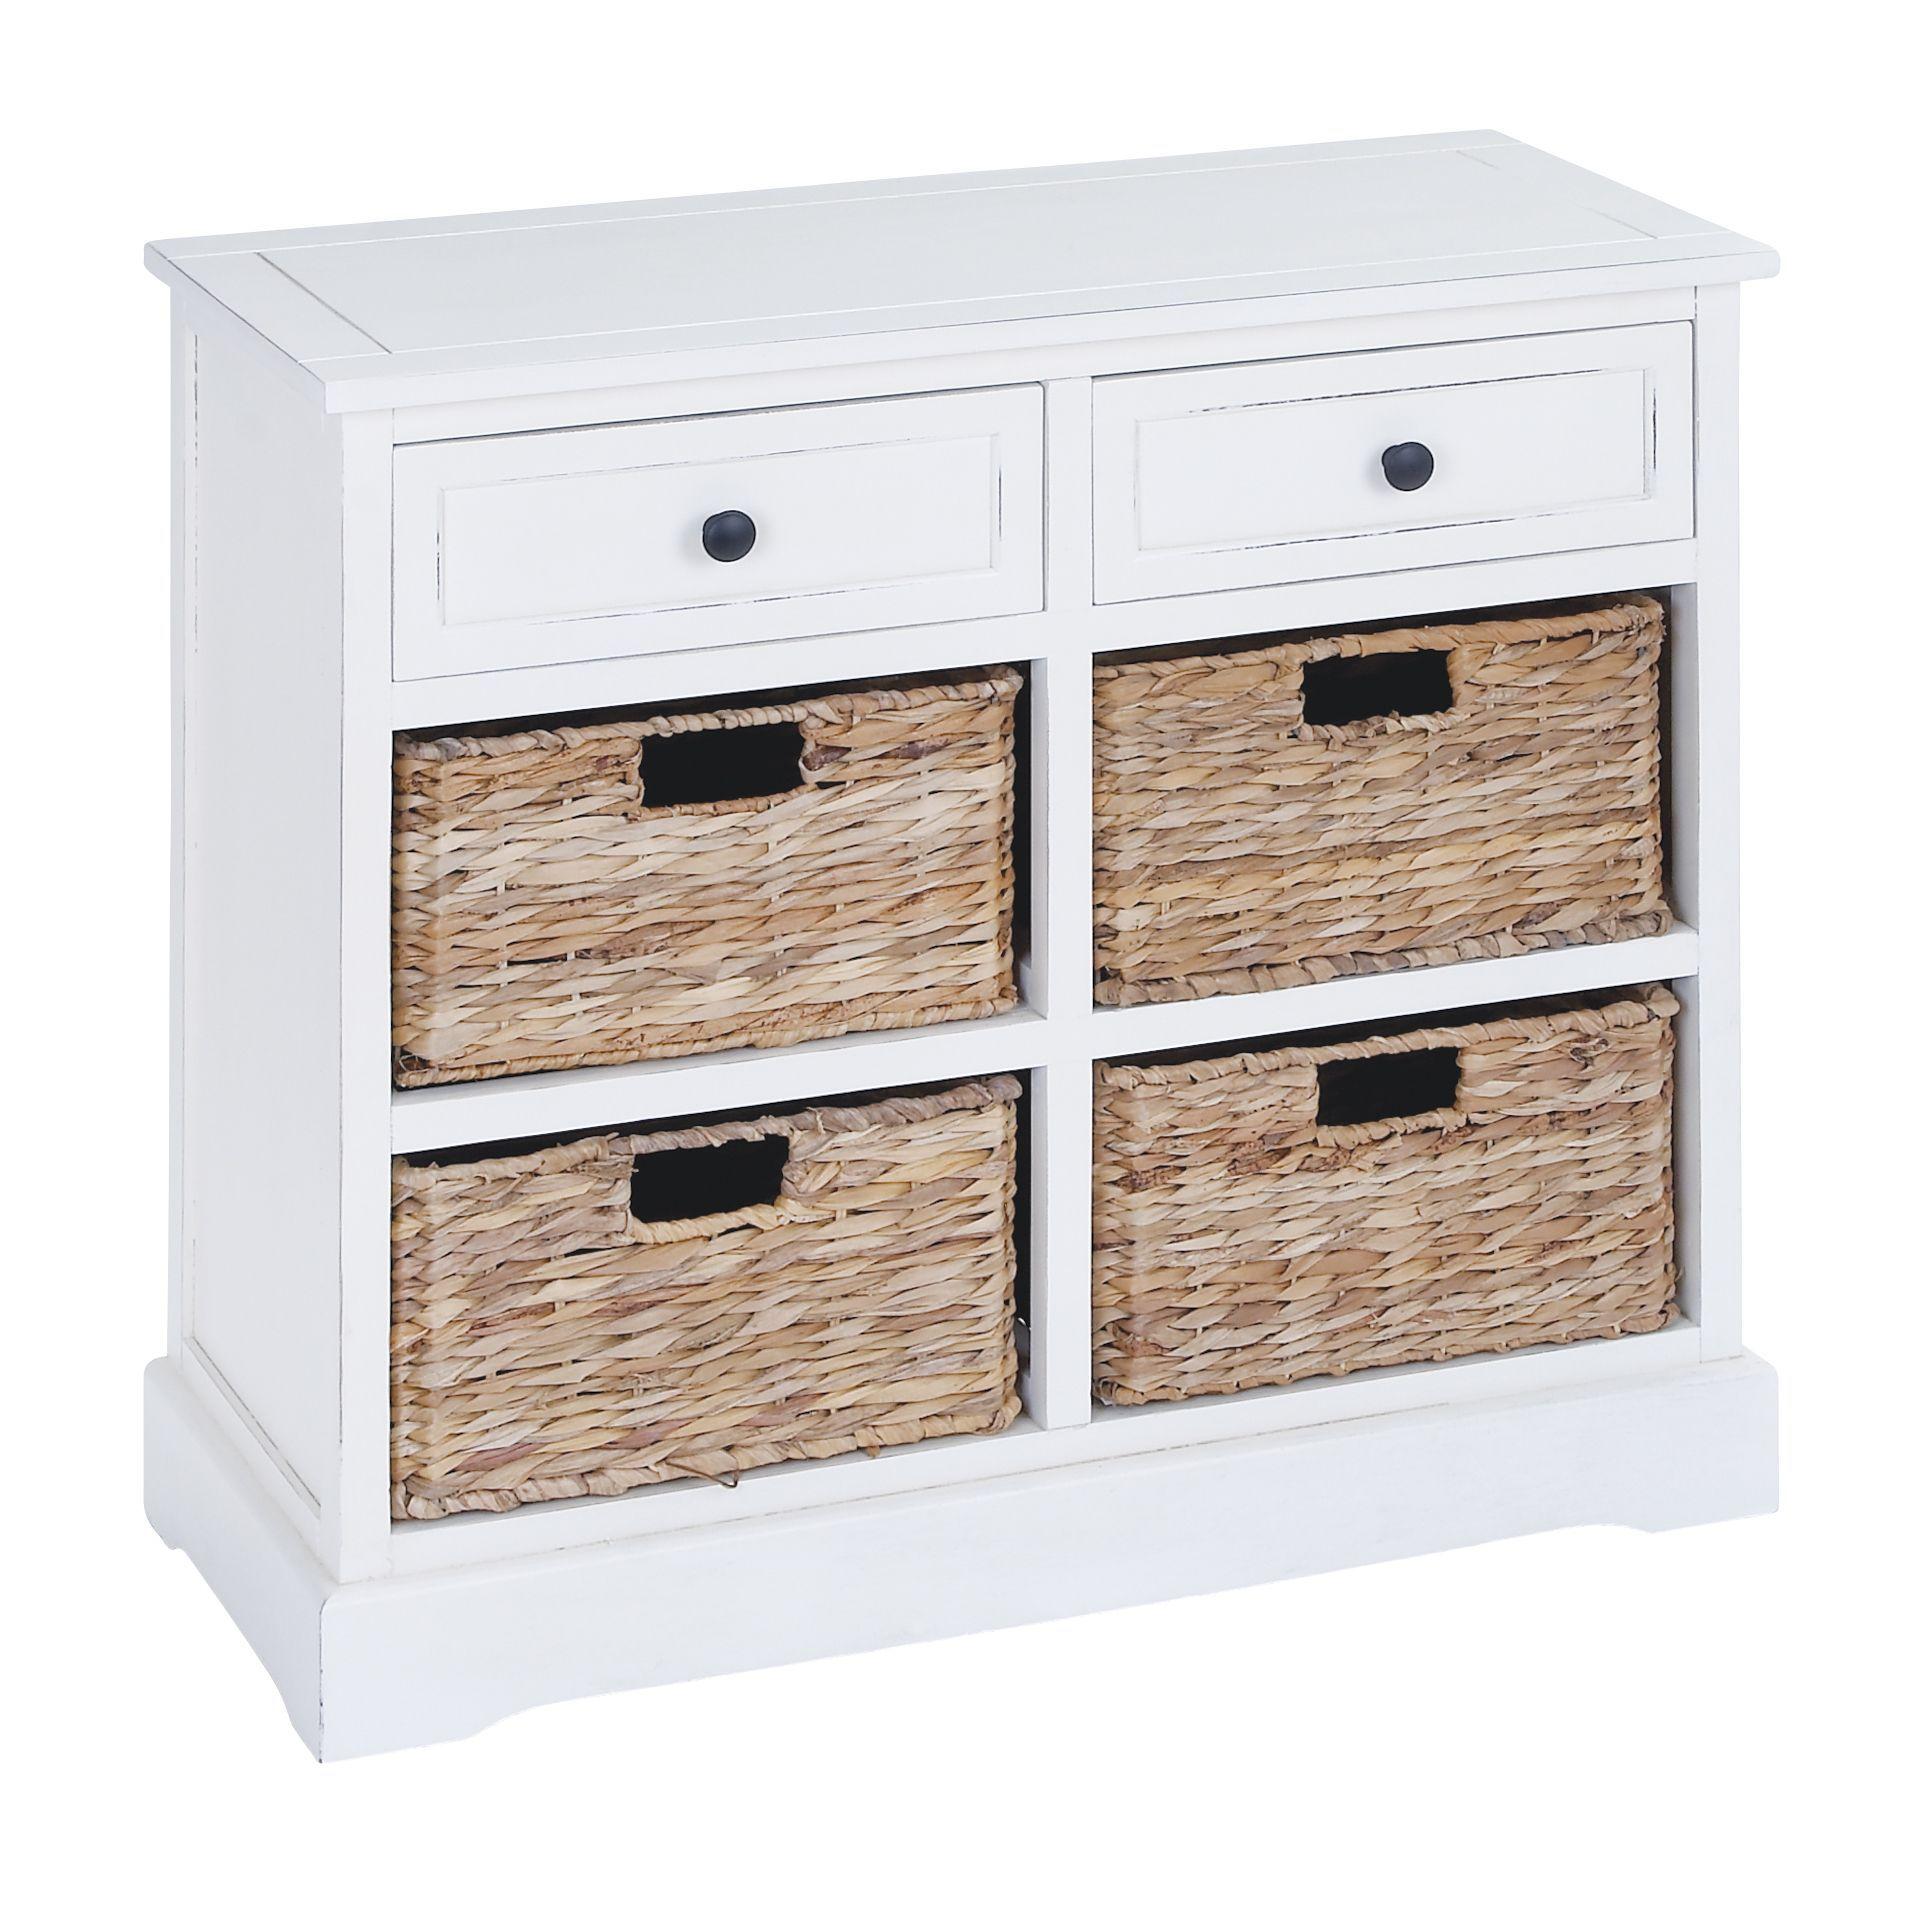 Antique White Wooden 4-Basket Cabinet by Studio 350 | Washroom ...